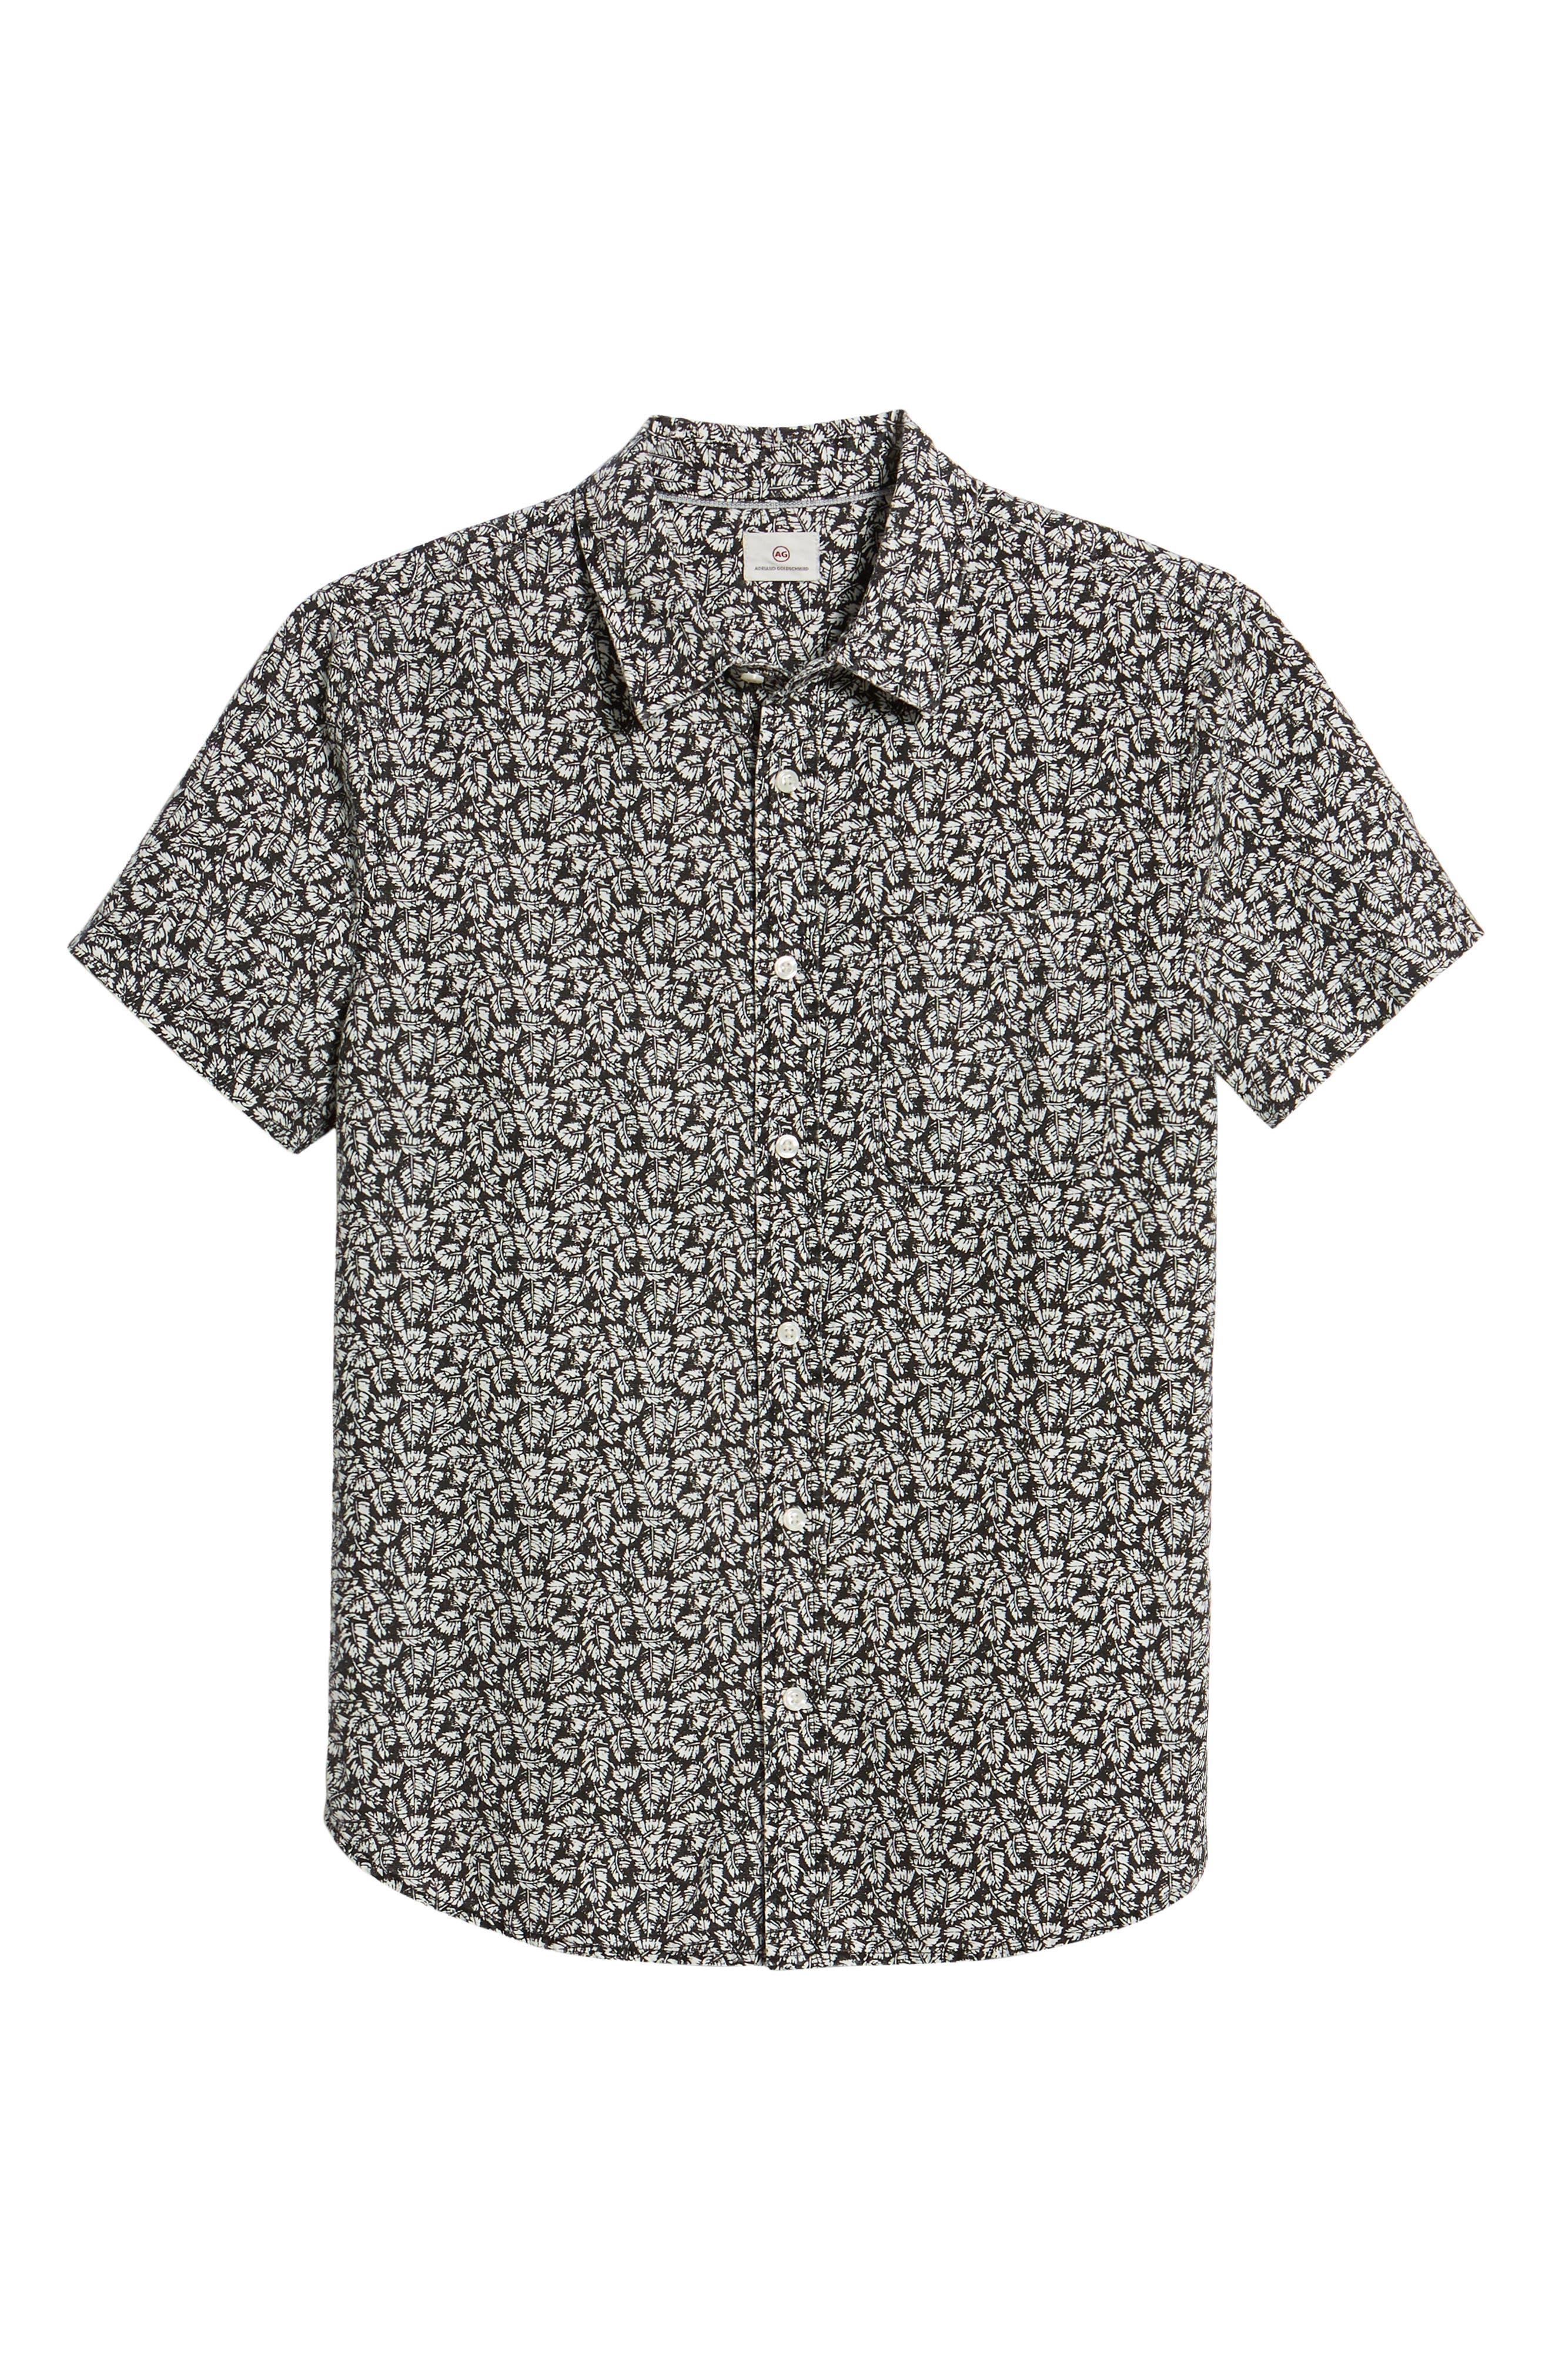 Nash Regular Fit Short Sleeve Sport Shirt,                             Alternate thumbnail 6, color,                             Palm Leaf True Black/ White